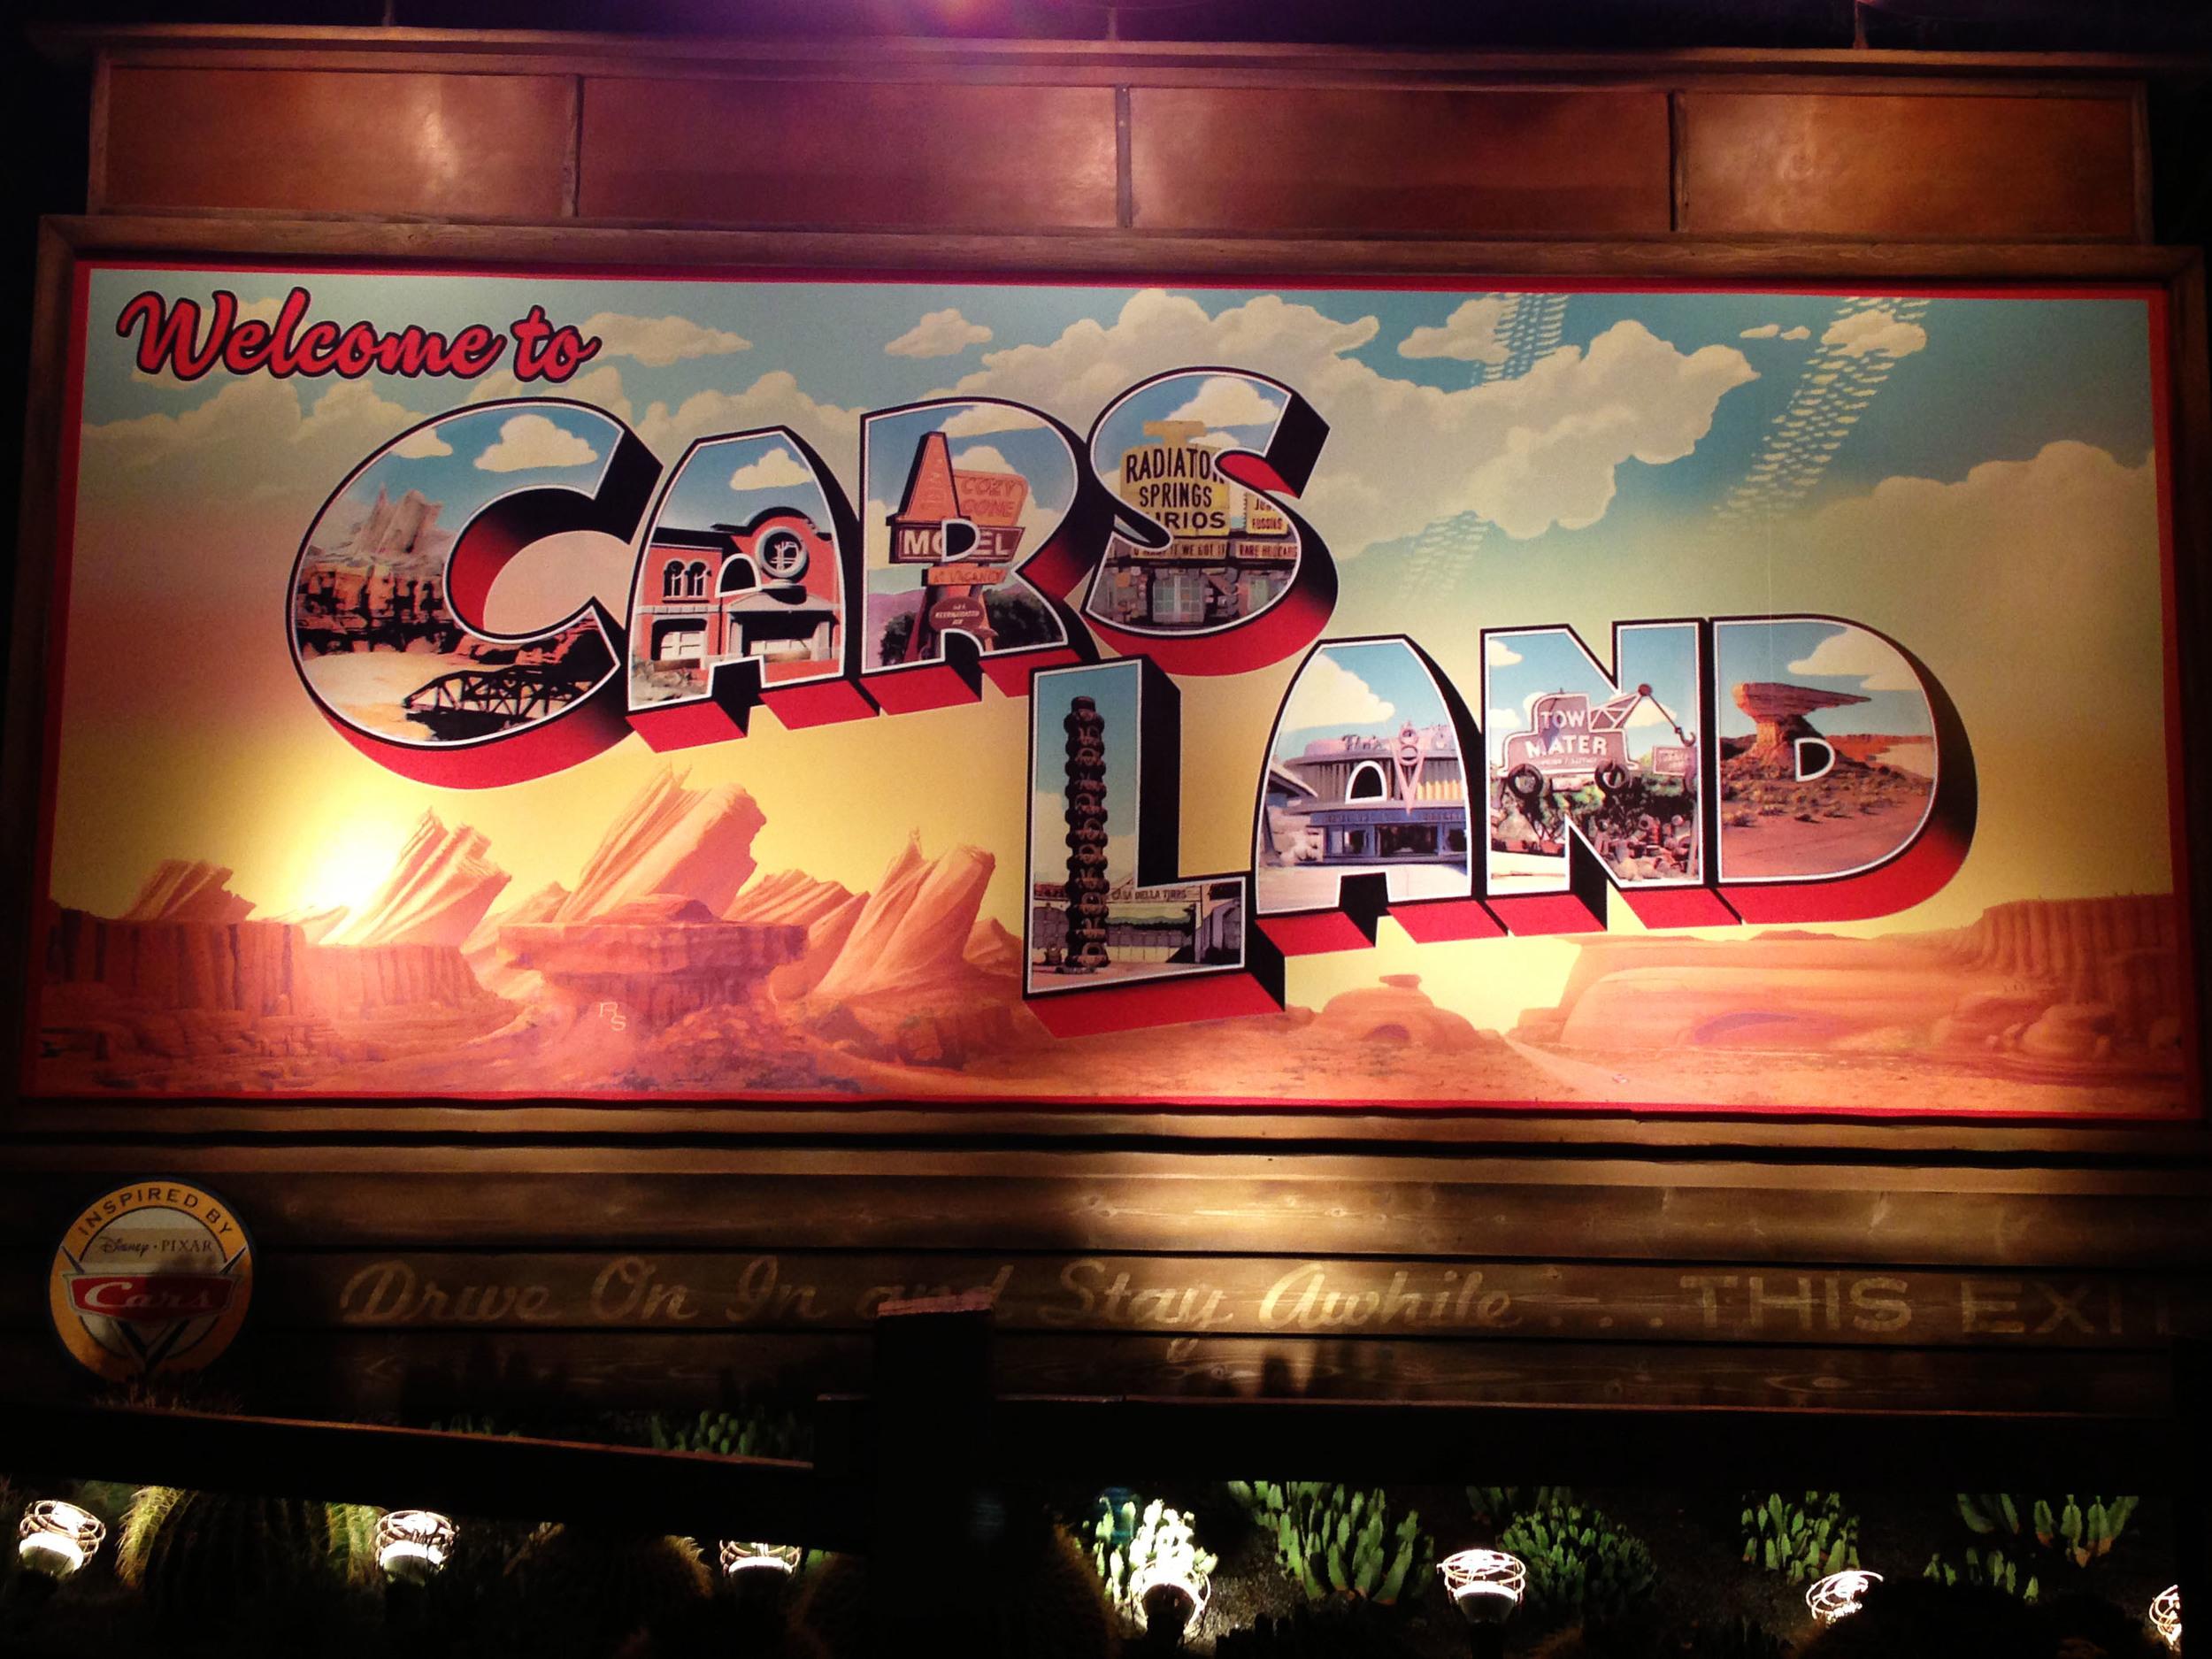 carsland.jpg